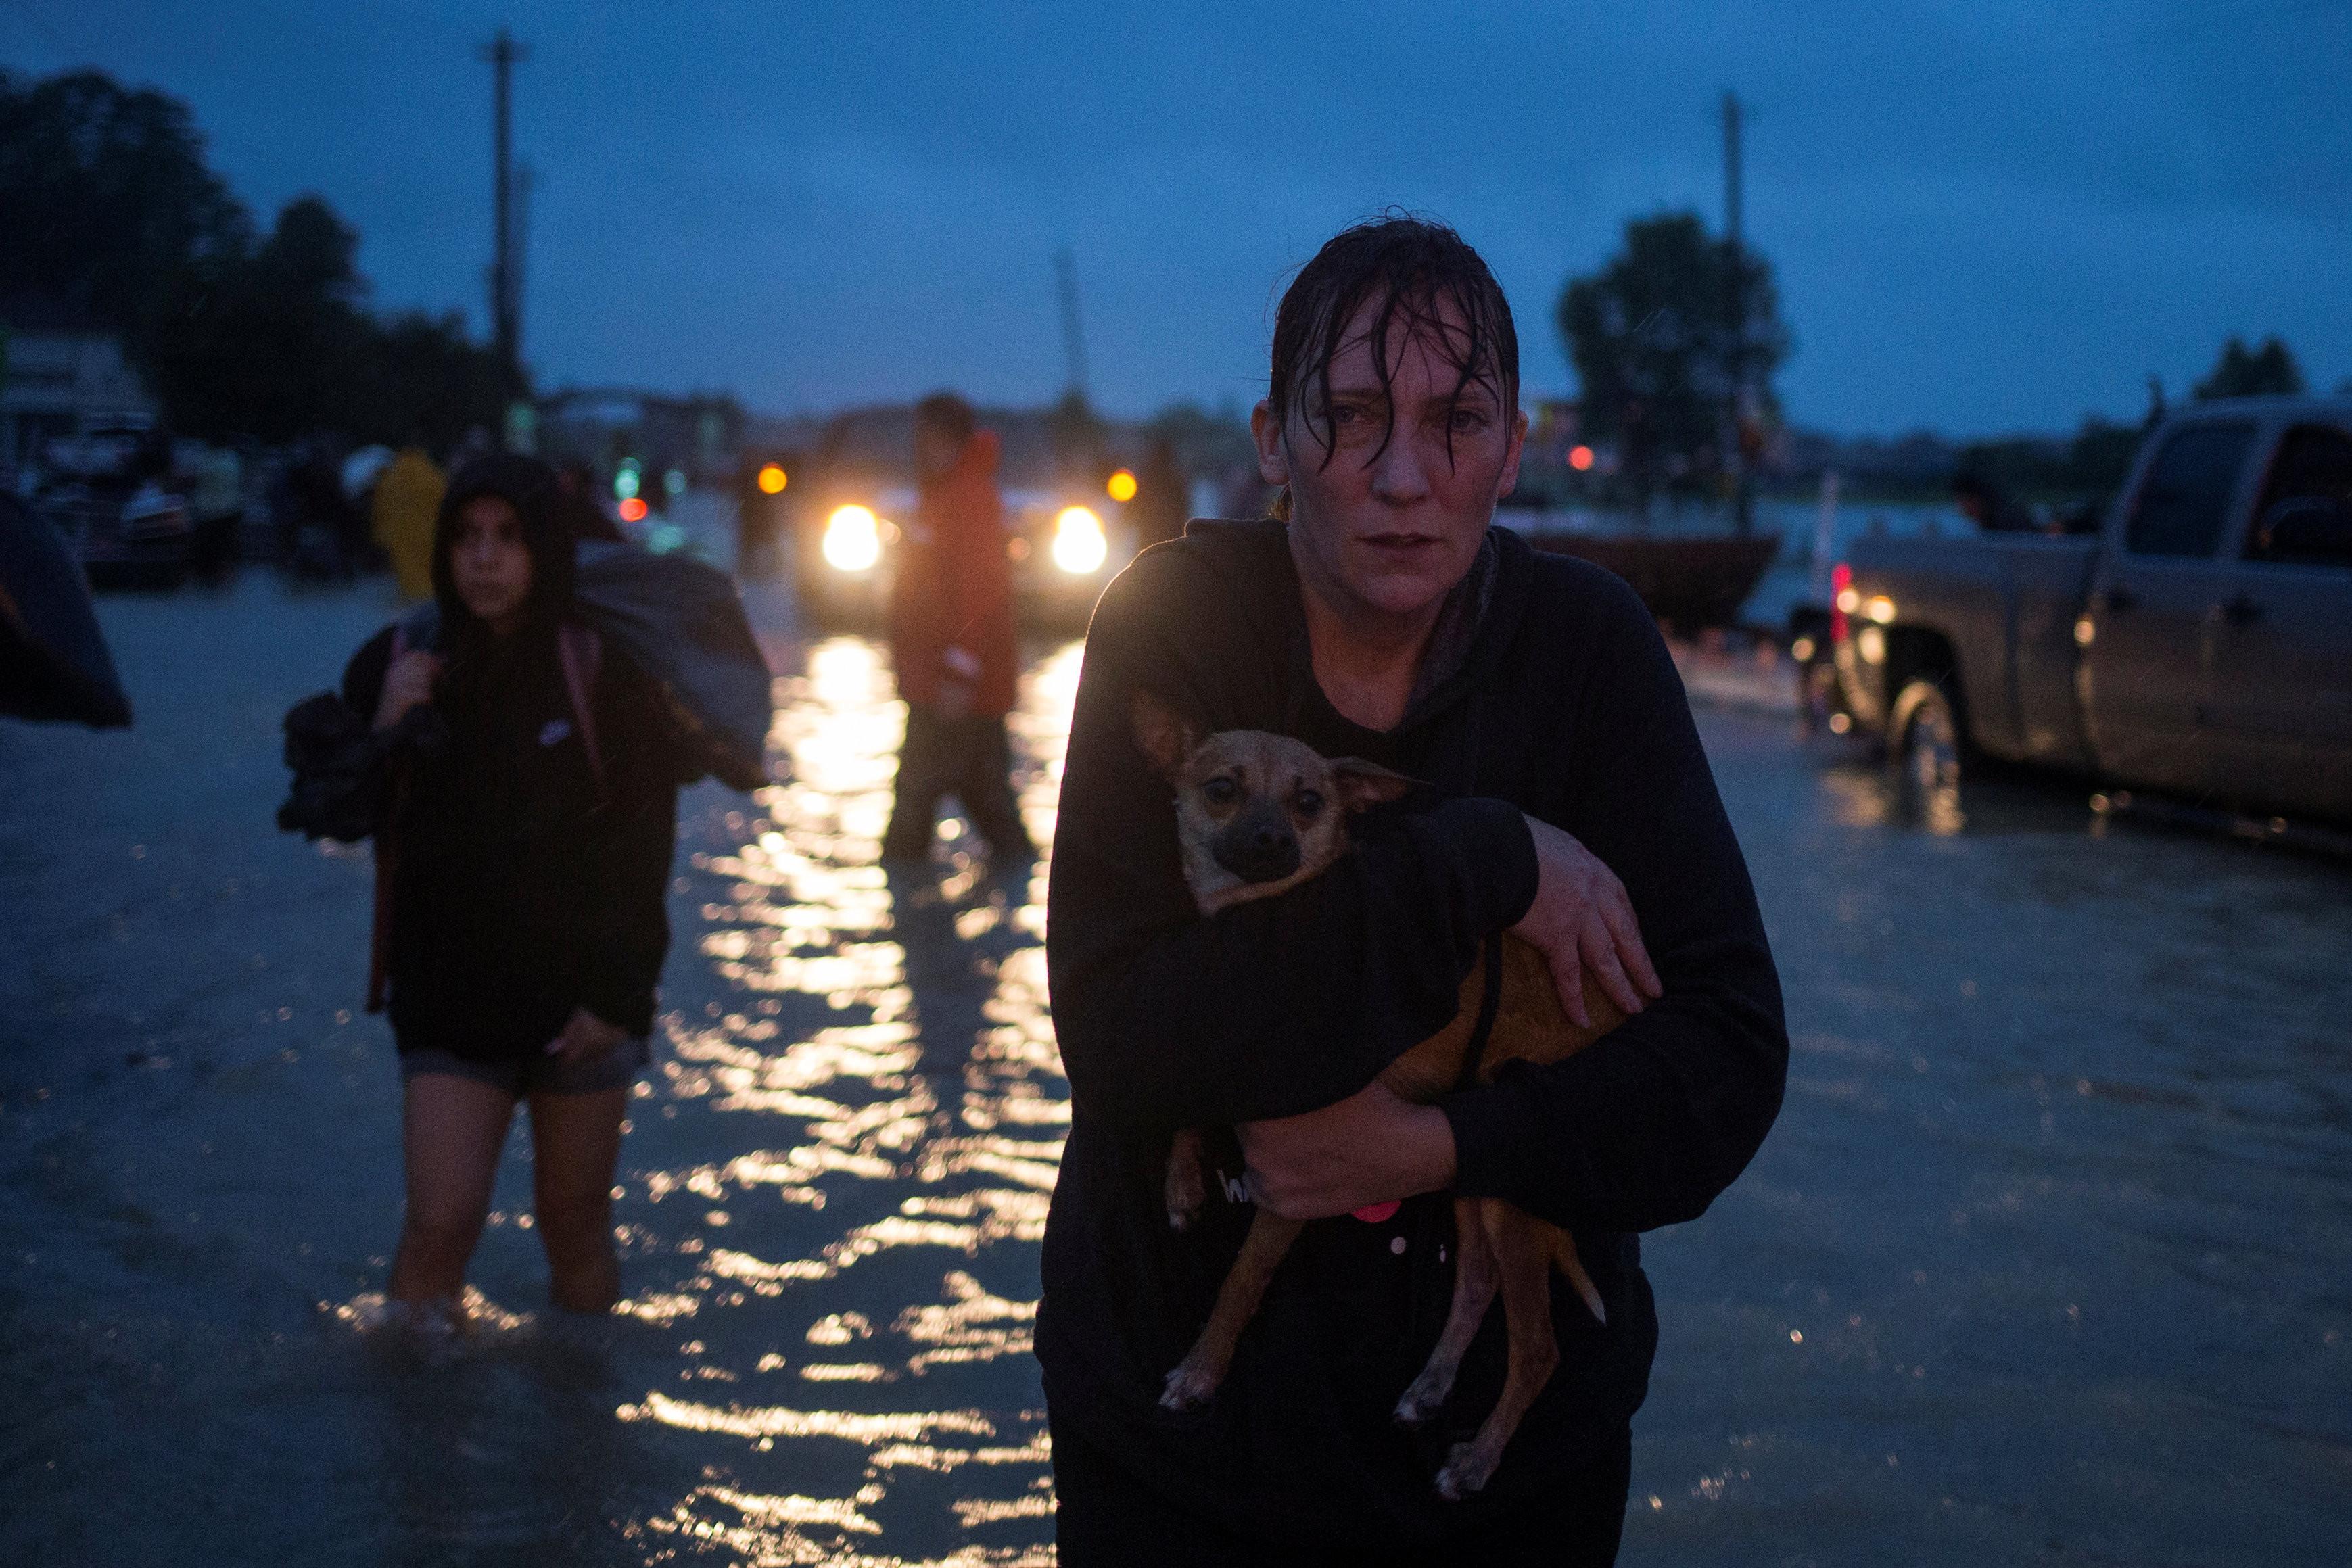 <p><span>Жители Хьюстона (штат Техас), пострадавшие от урагана Харви</span></p> <p><span>Фото:&nbsp;&copy;REUTERS/Adrees Latif&nbsp;</span></p>